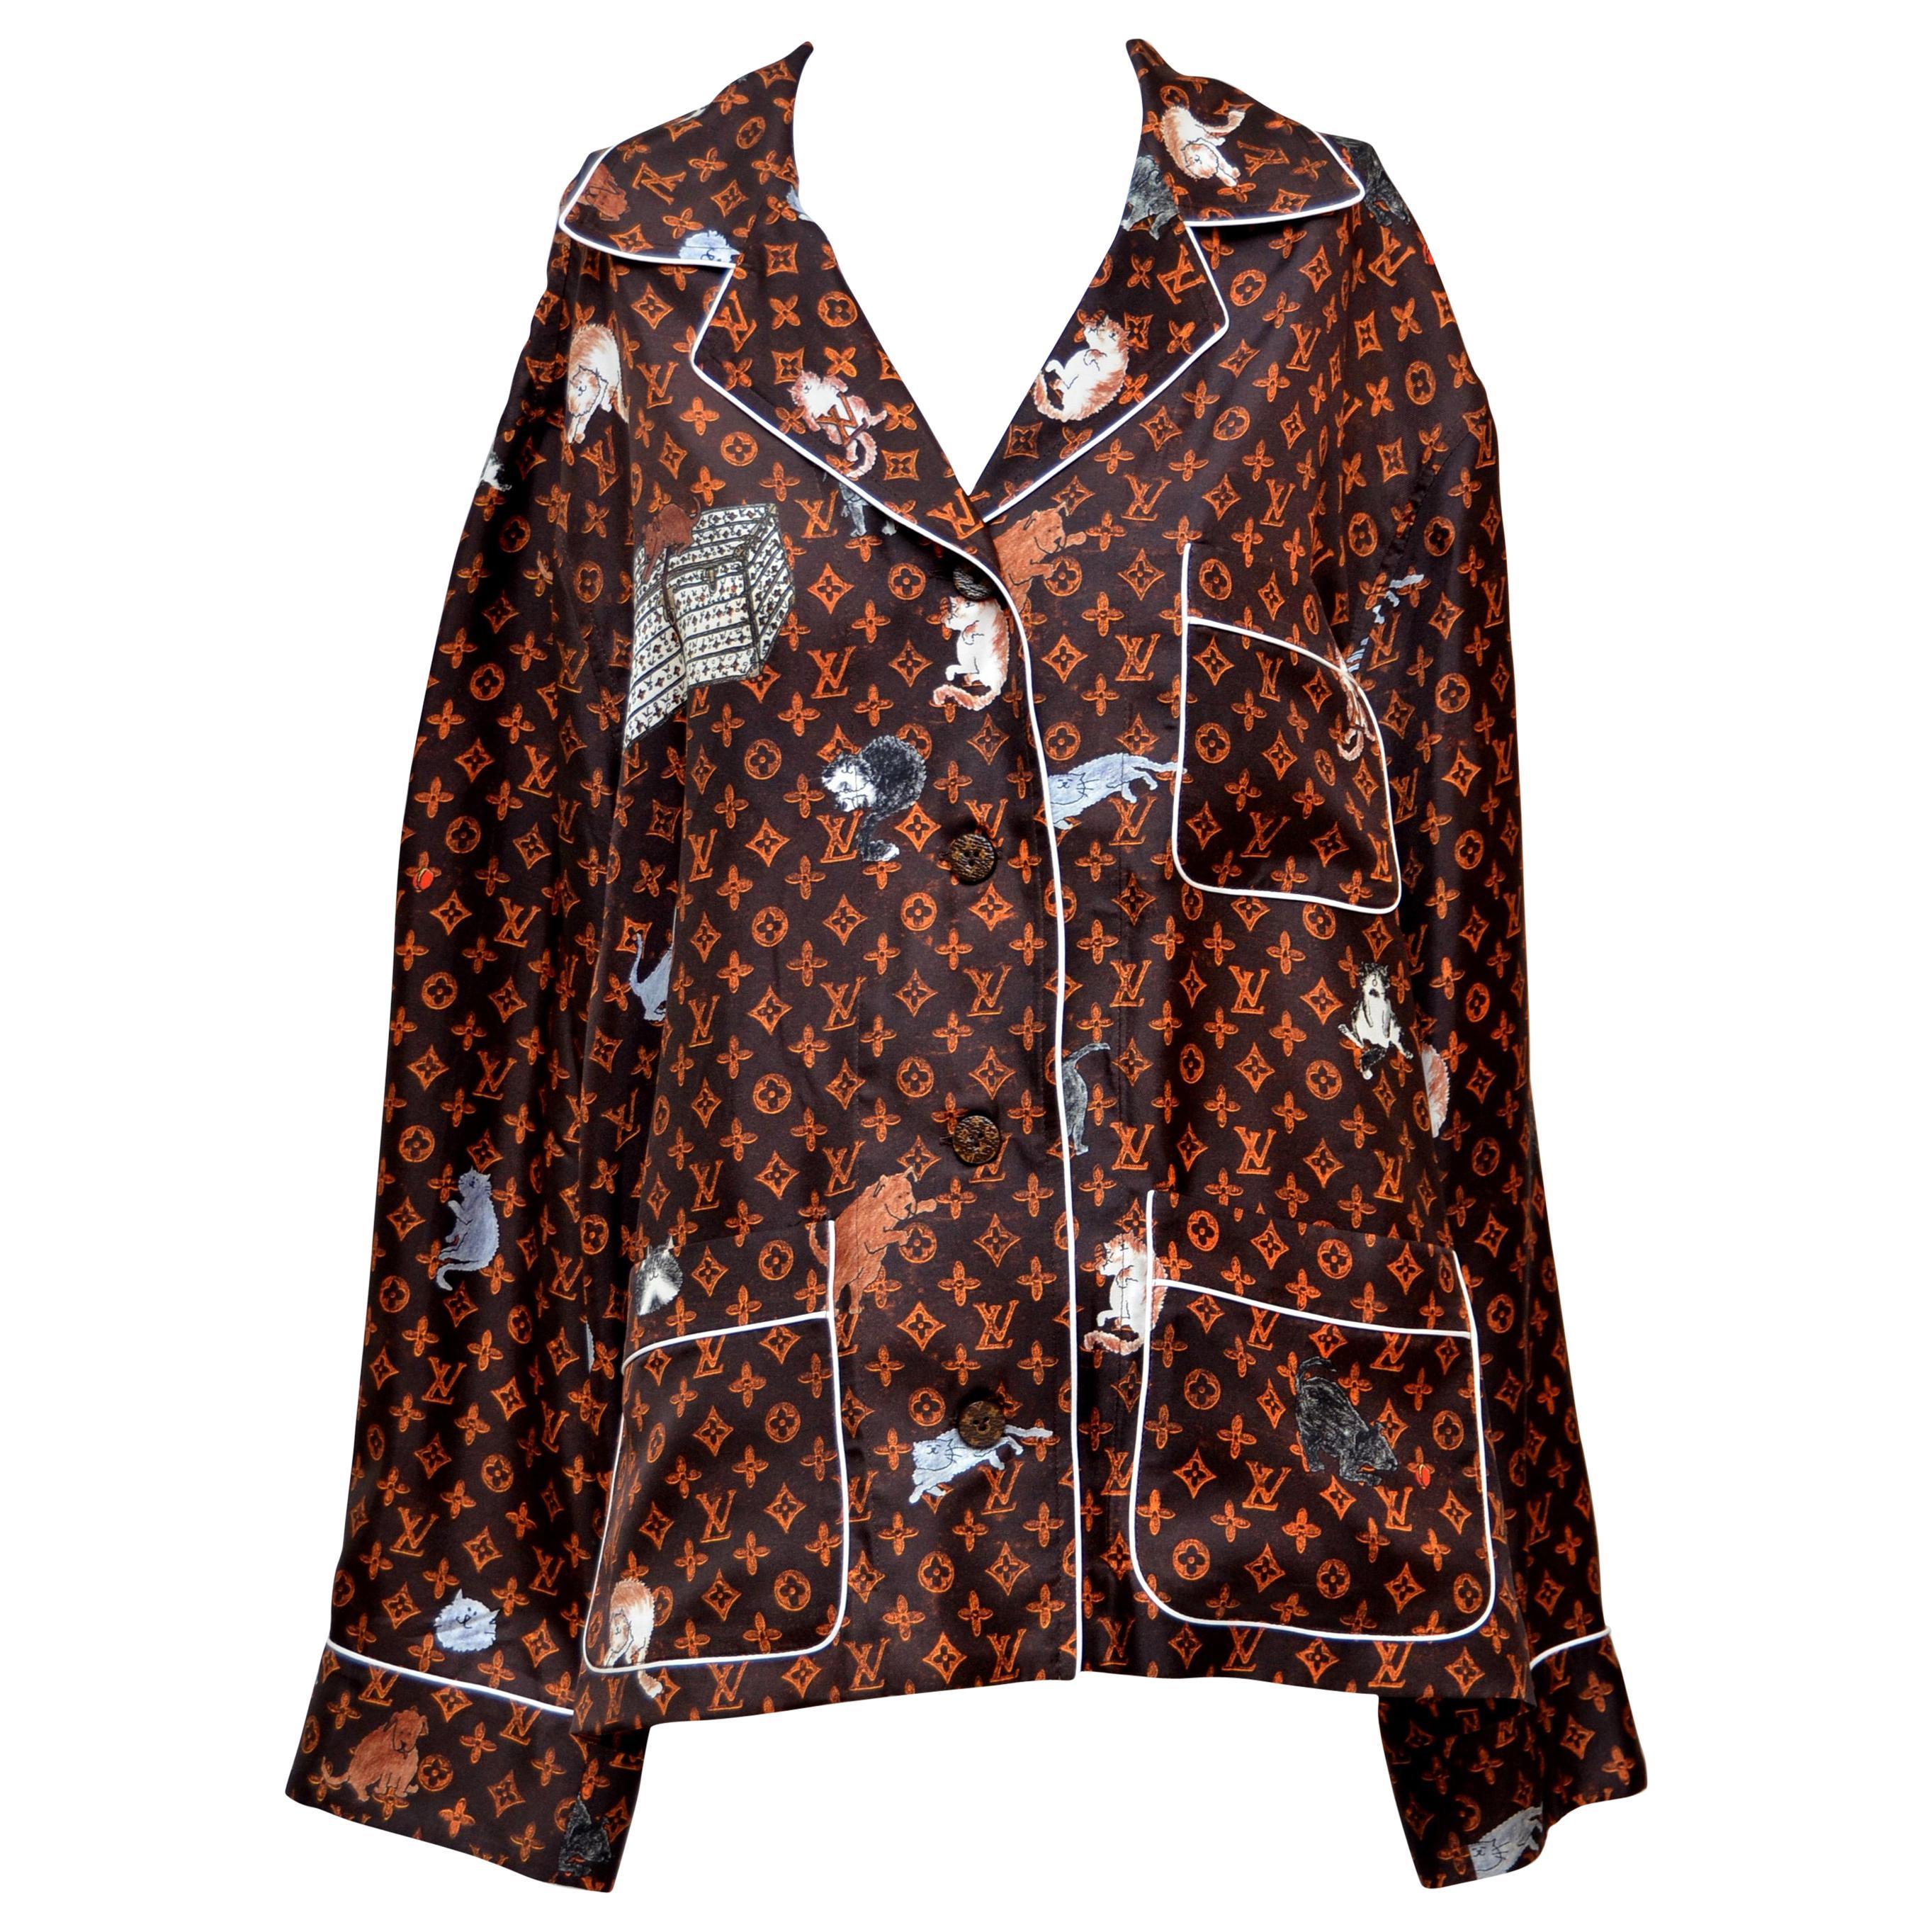 LOUIS VUITTON X  Grace Coddington  Catogram  Silk Shirt   Size 40 New